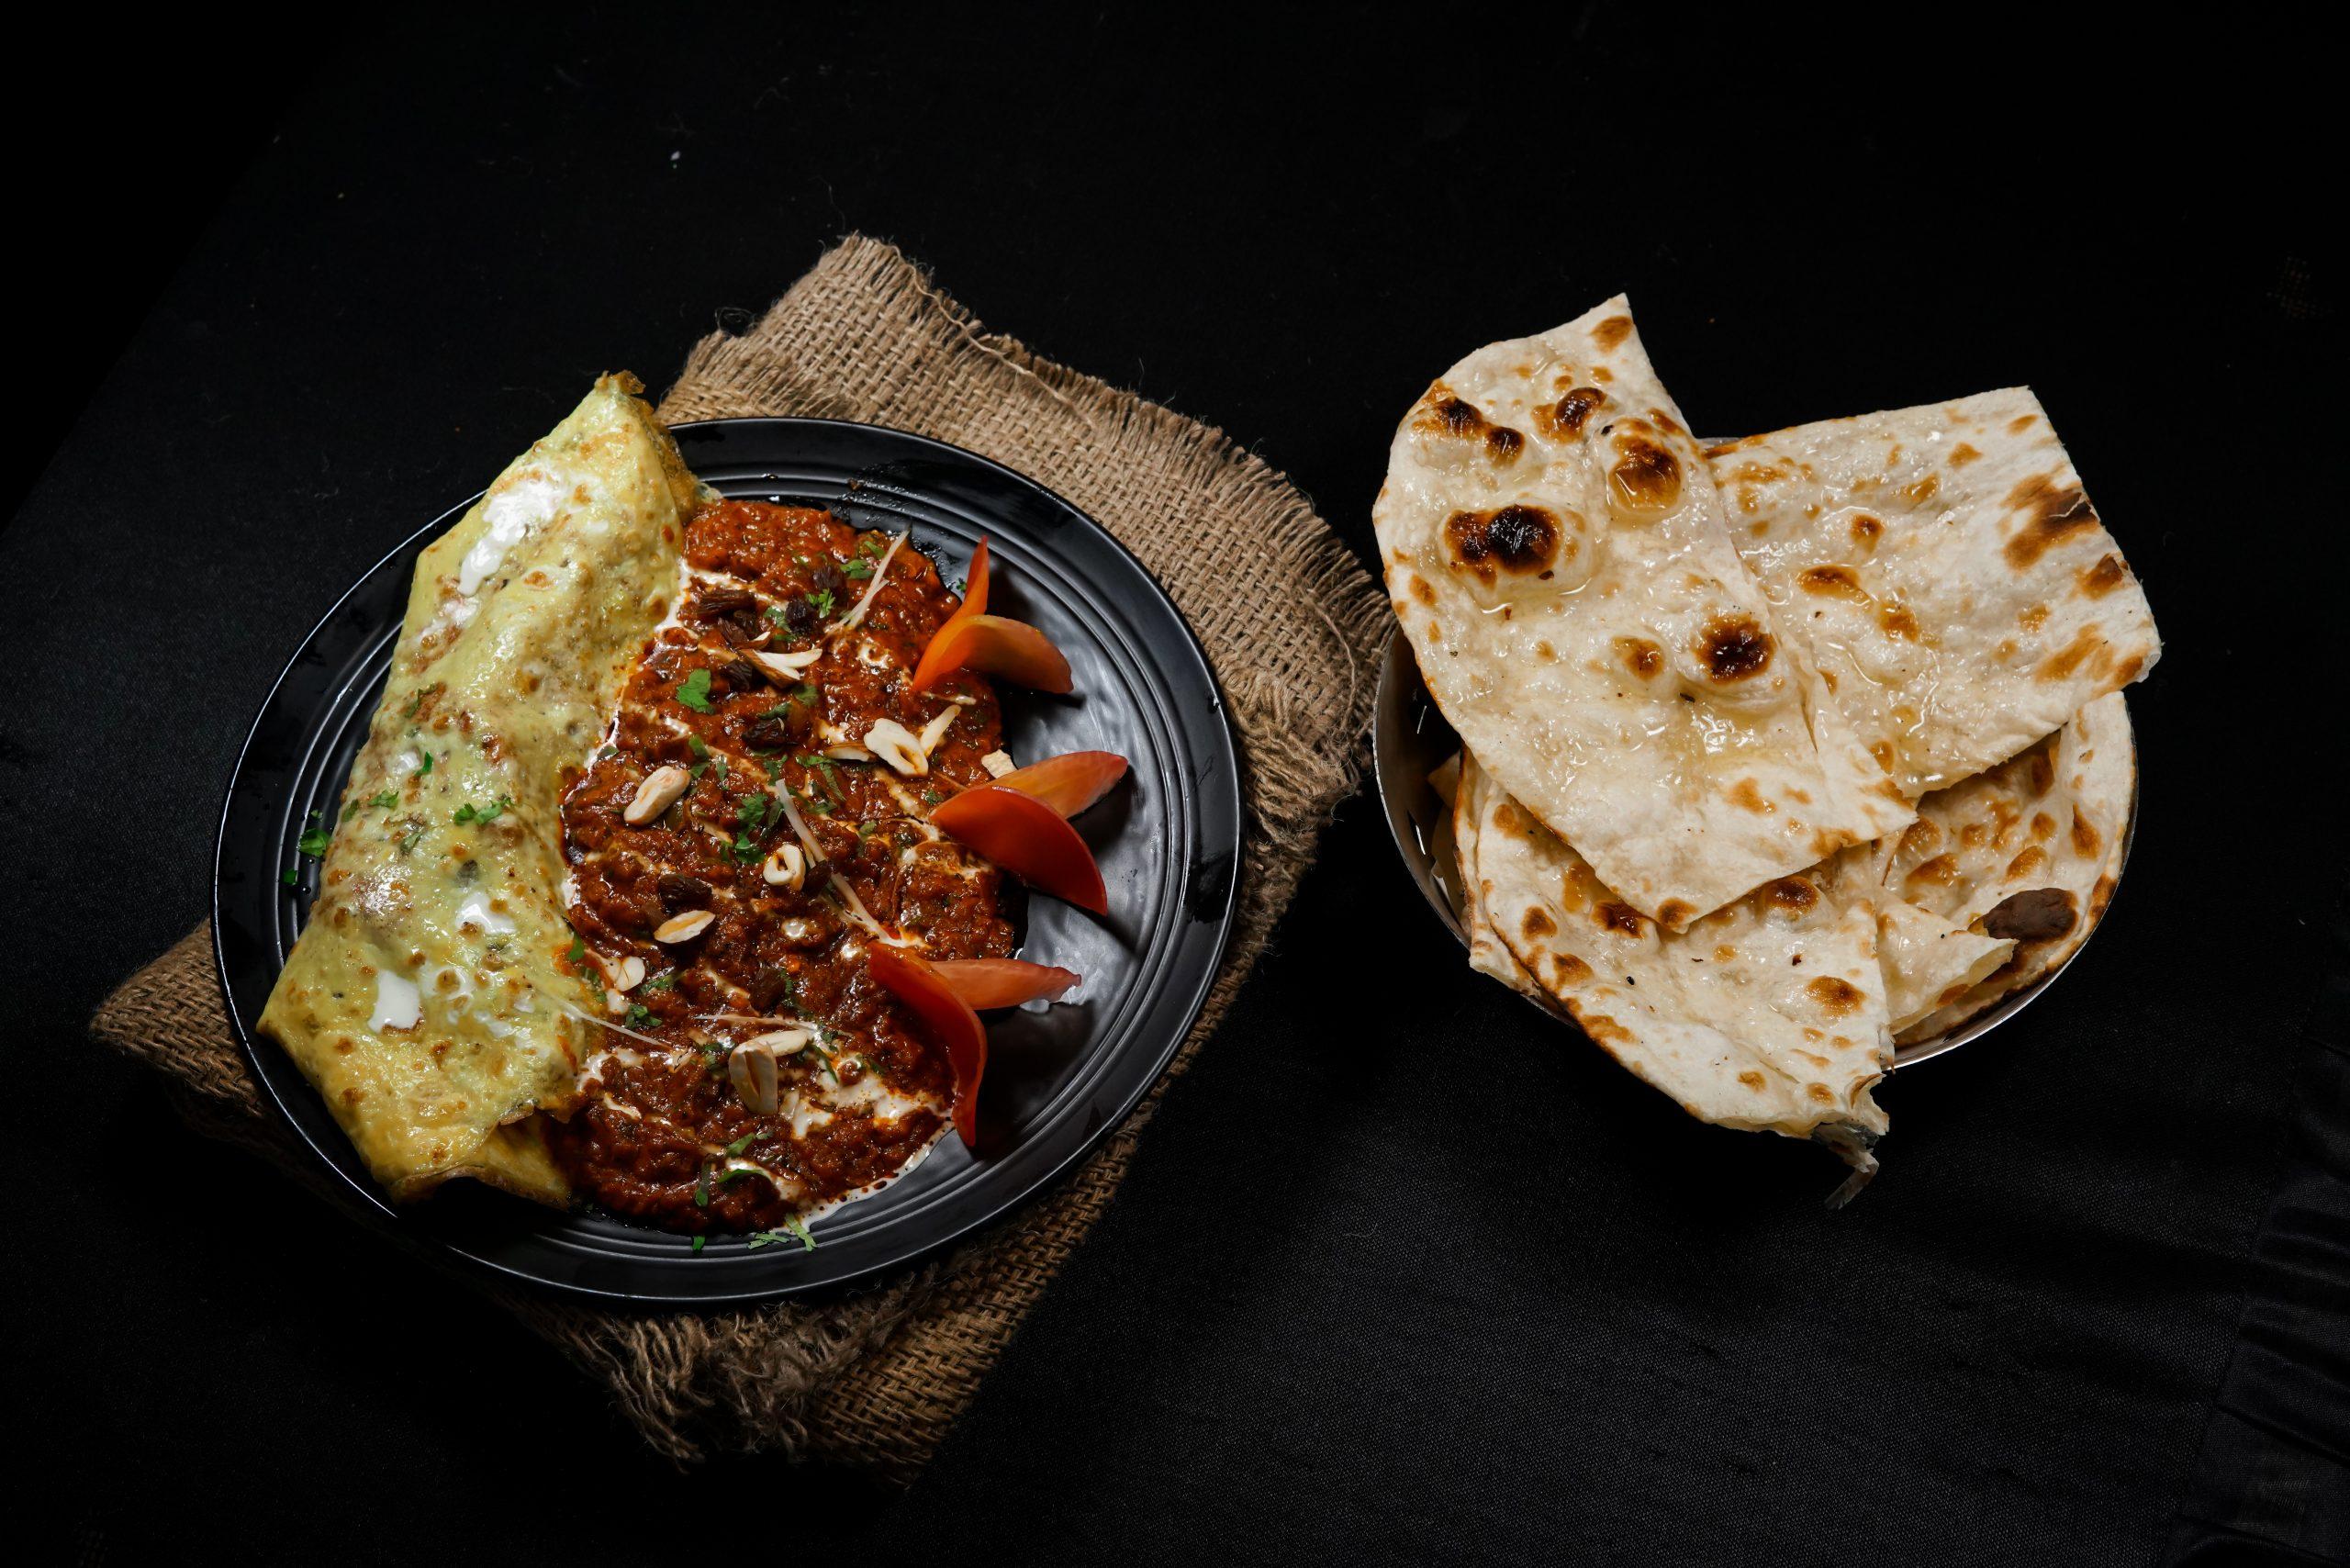 Tandoori Roti with Masala Vegetables